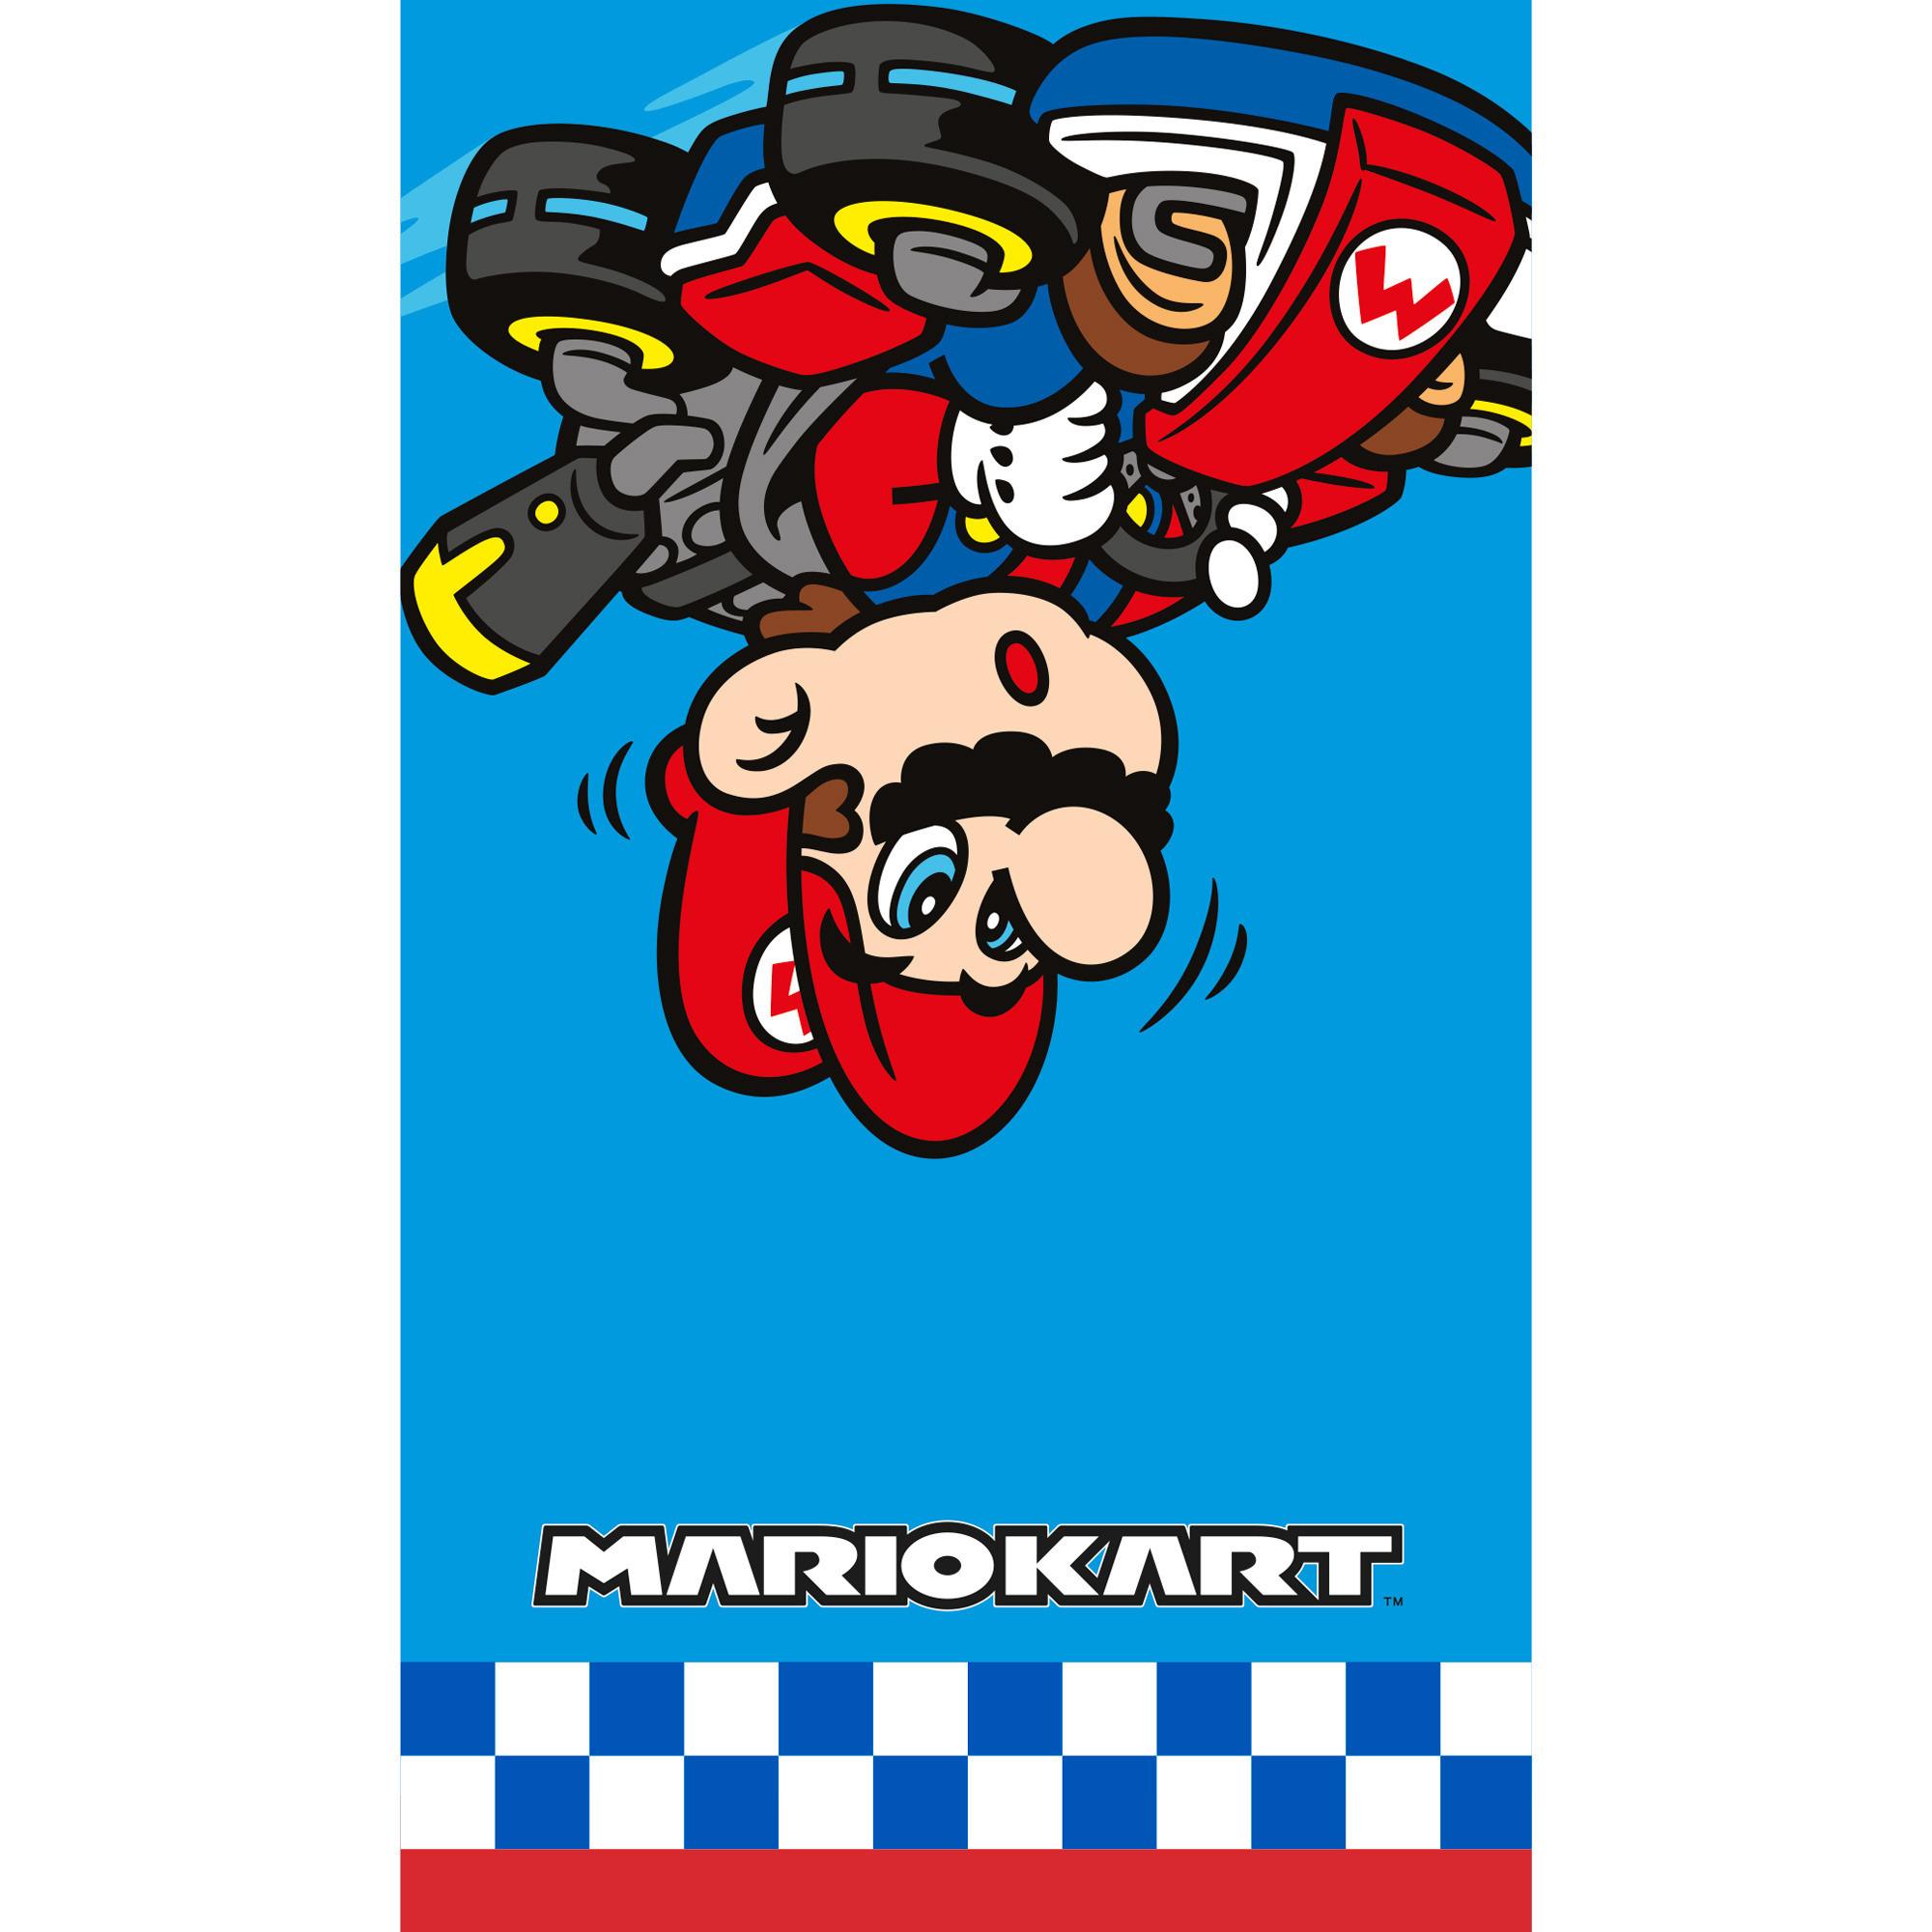 Nintendo Mariokart badlaken-strandlaken 70 x 120 cm